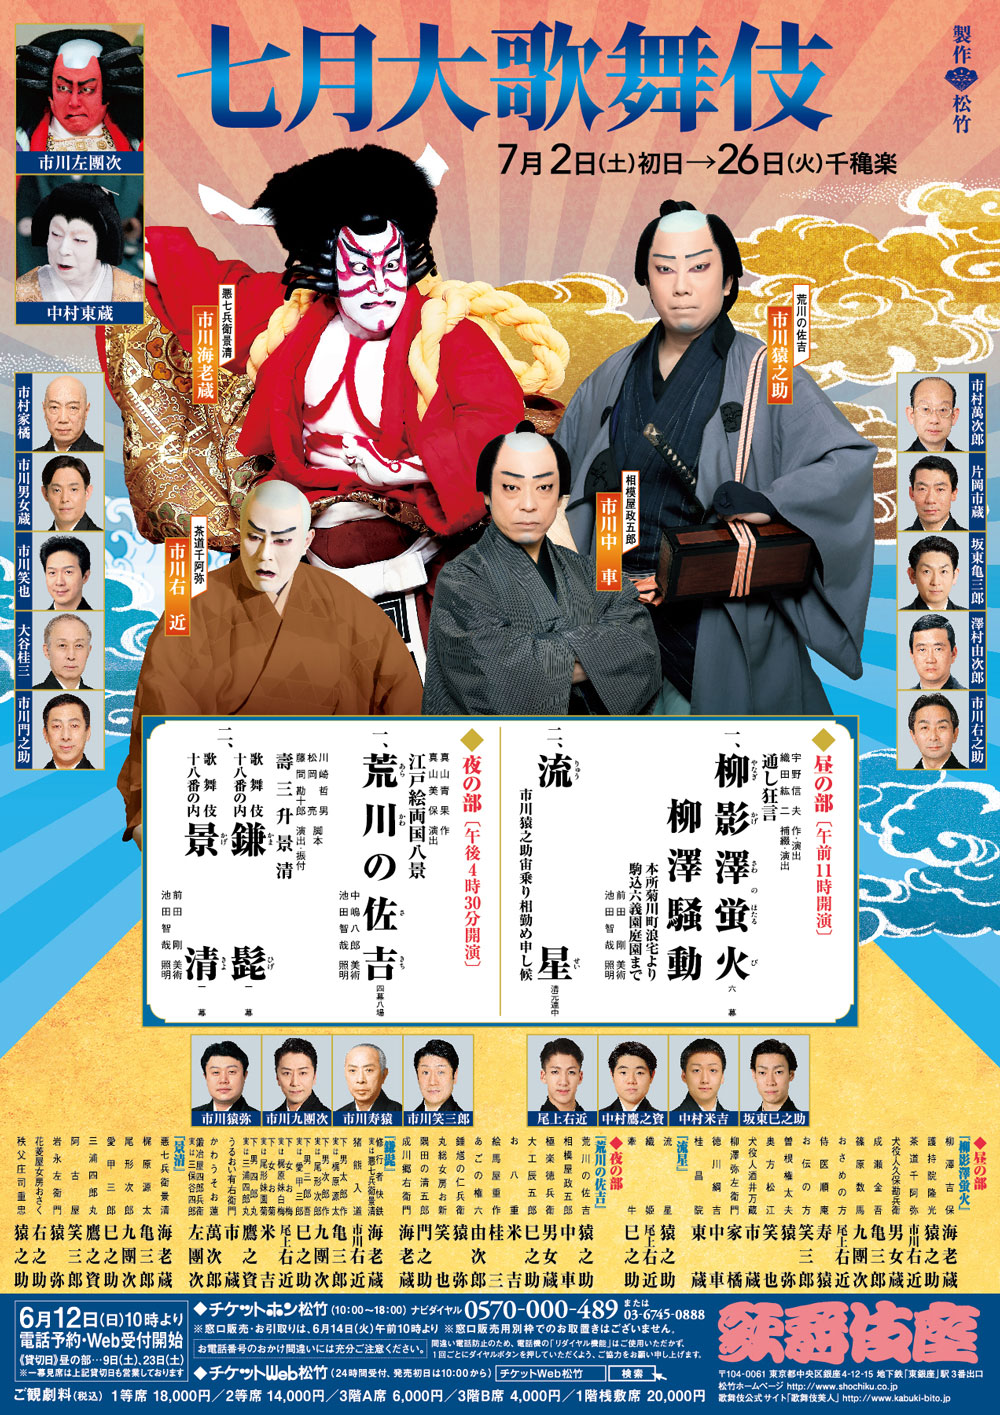 http://www.kabuki-bito.jp/uploads/images/kouen/483/kabukiza_201607fffl_3a25bb3dc1e4b69a54dc8dbaf4127599.jpg